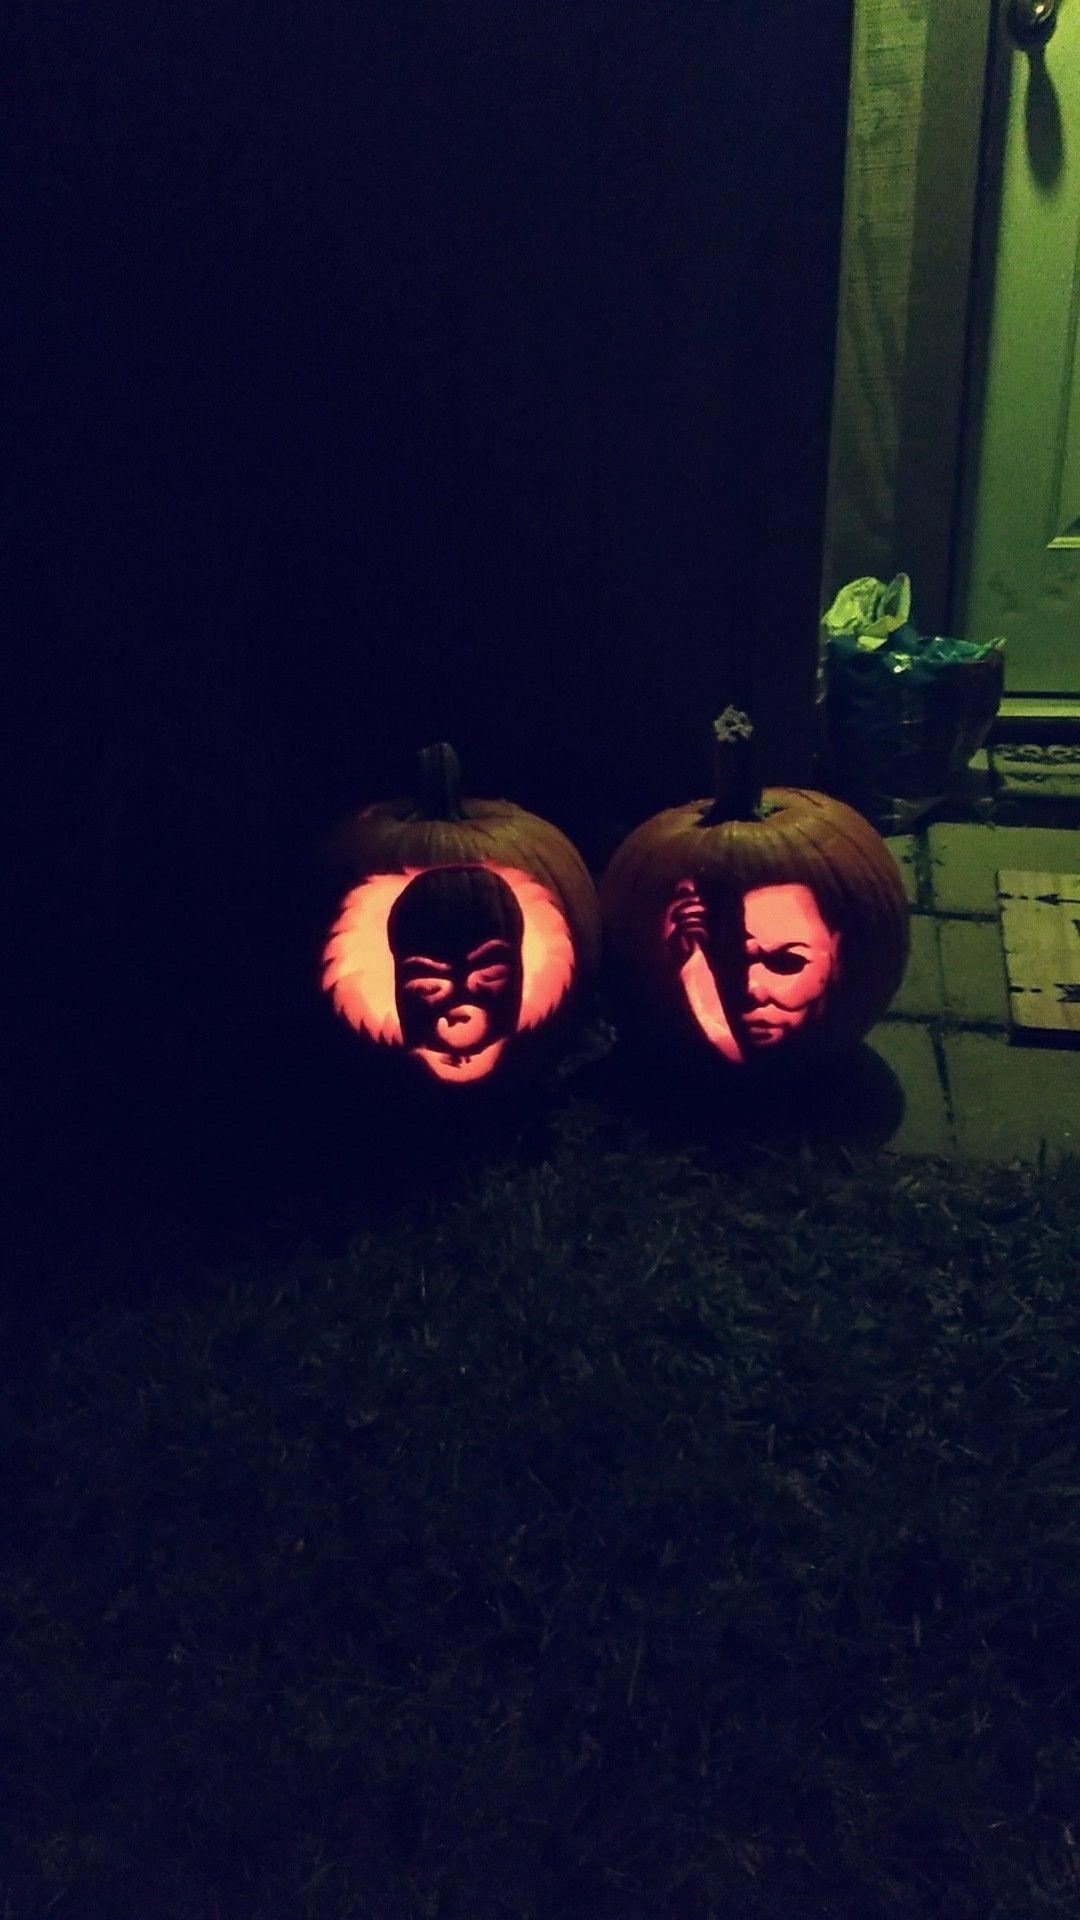 Pin by Cara Kilgore on my life Pumpkin carving, Carving